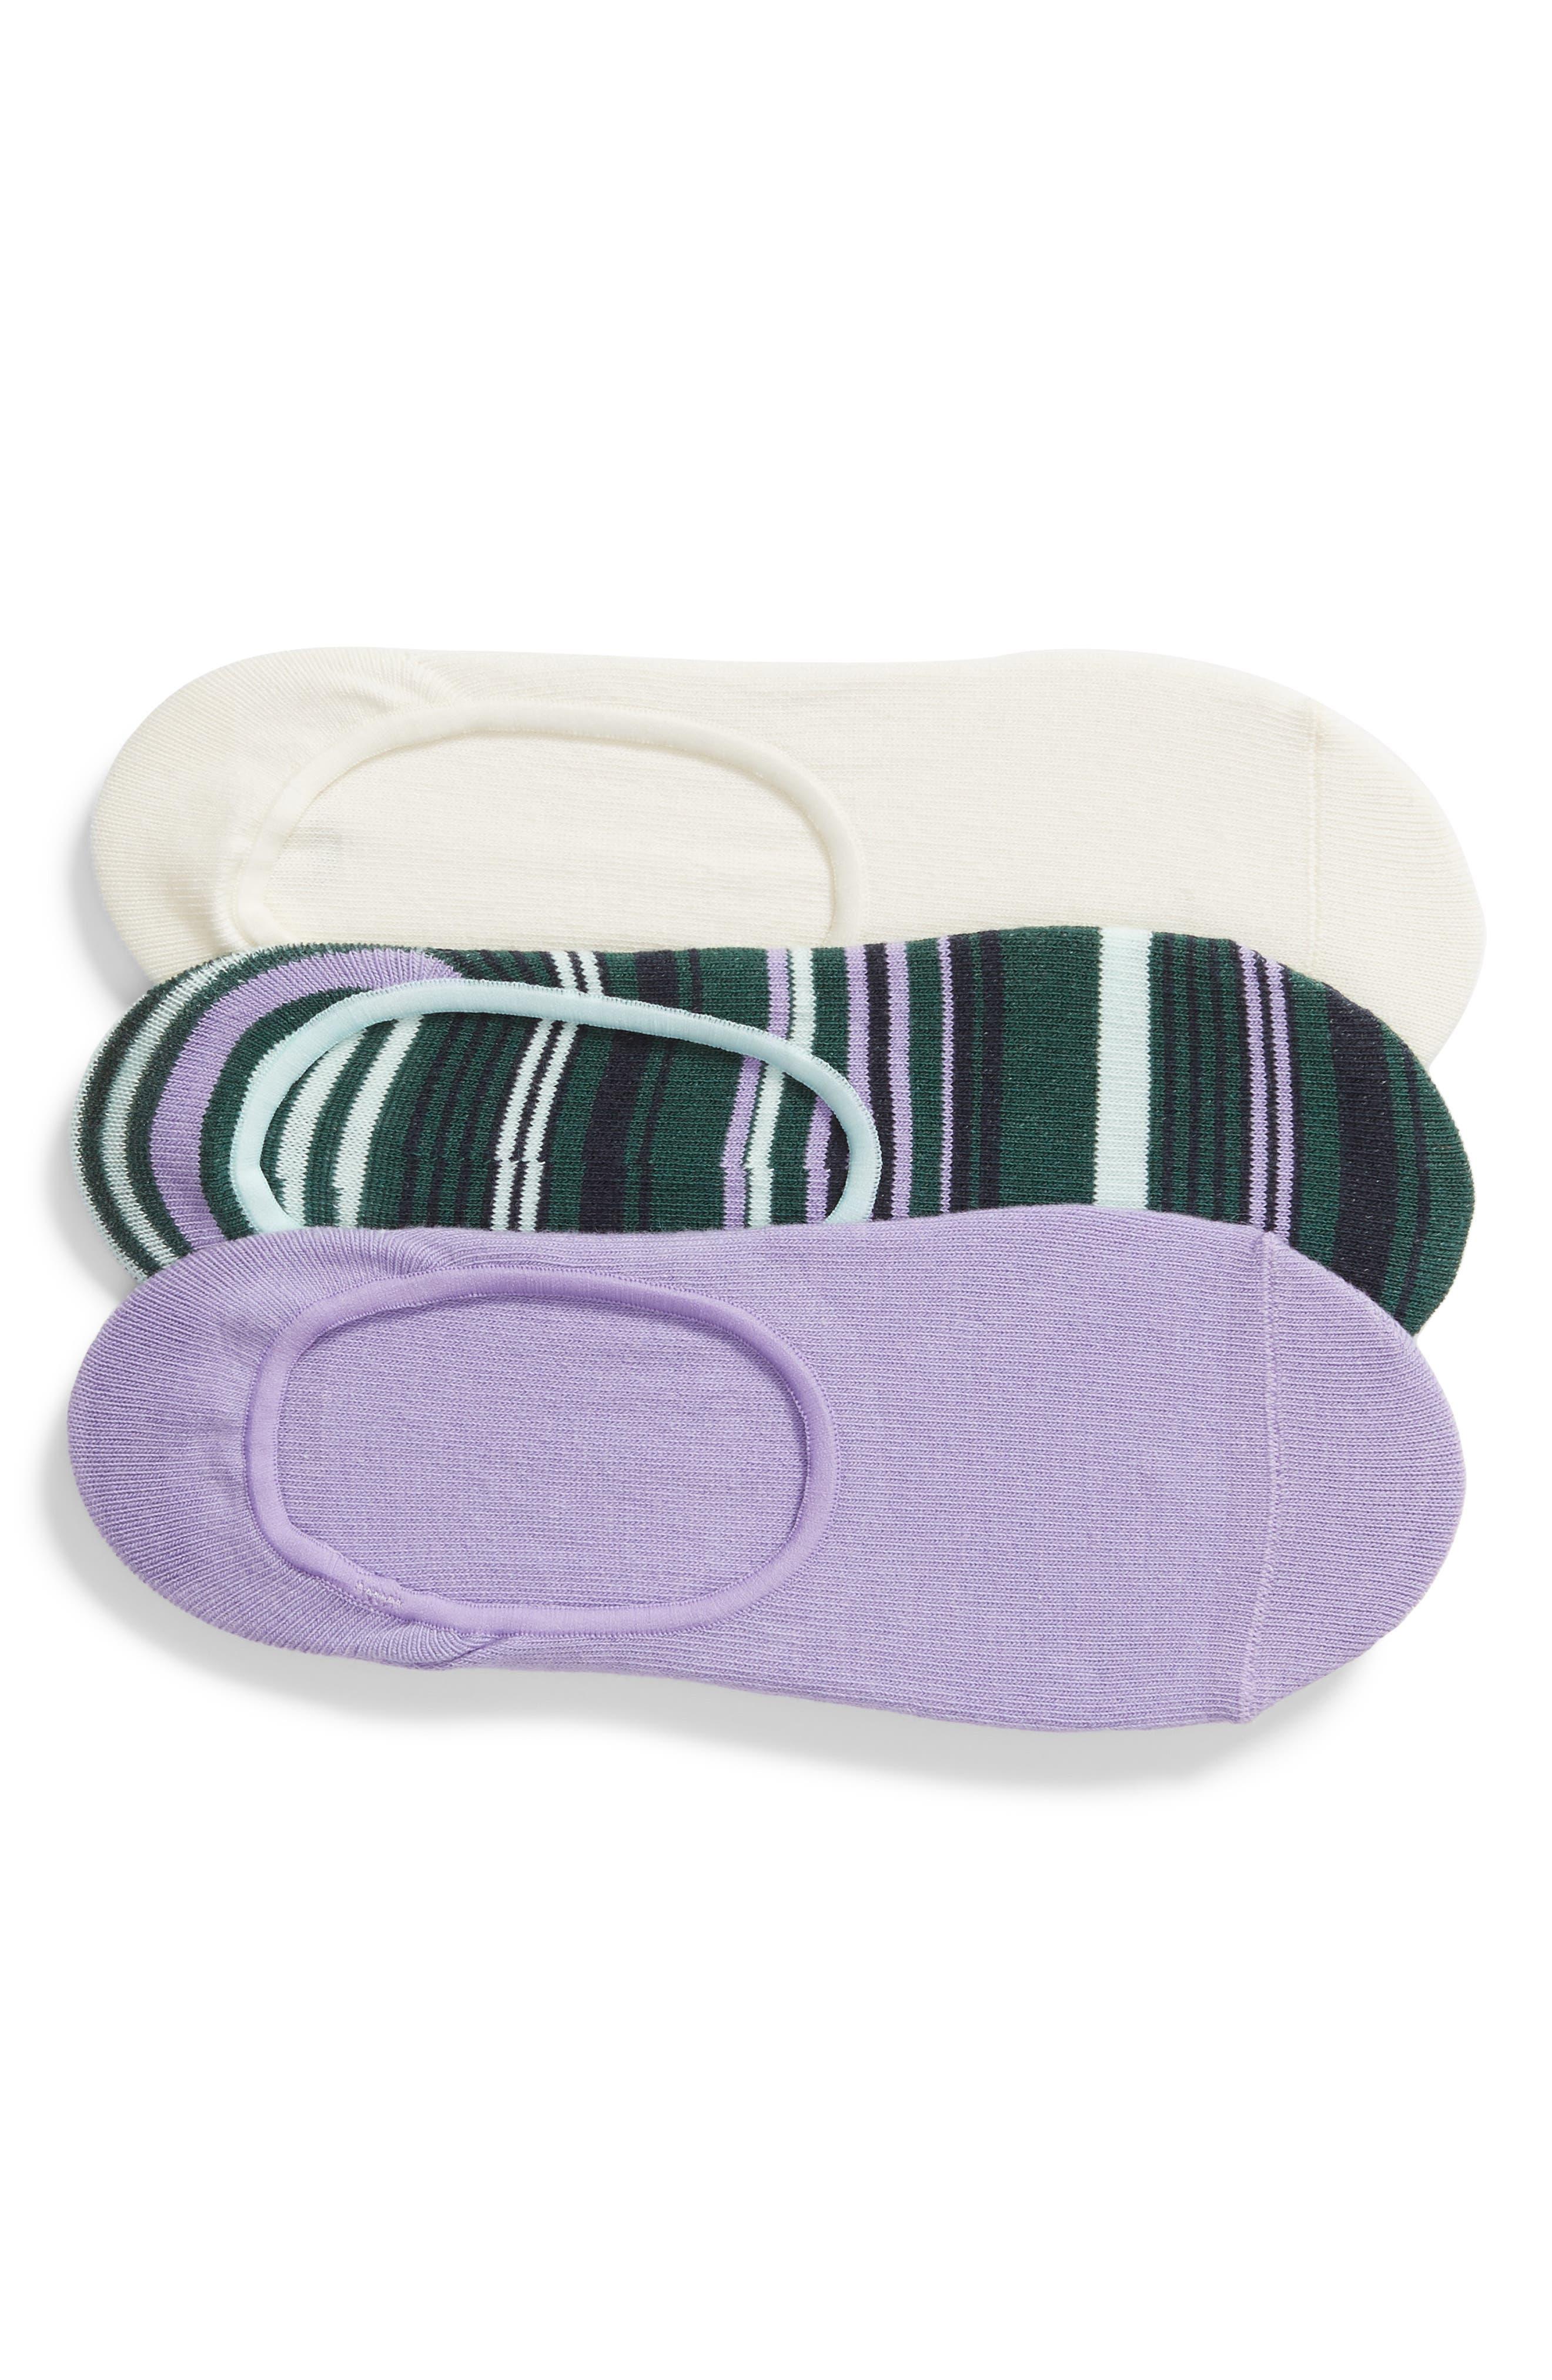 NORDSTROM 3-Pack No-Show Liner Socks, Main, color, PURPLE MITTEN MULTI